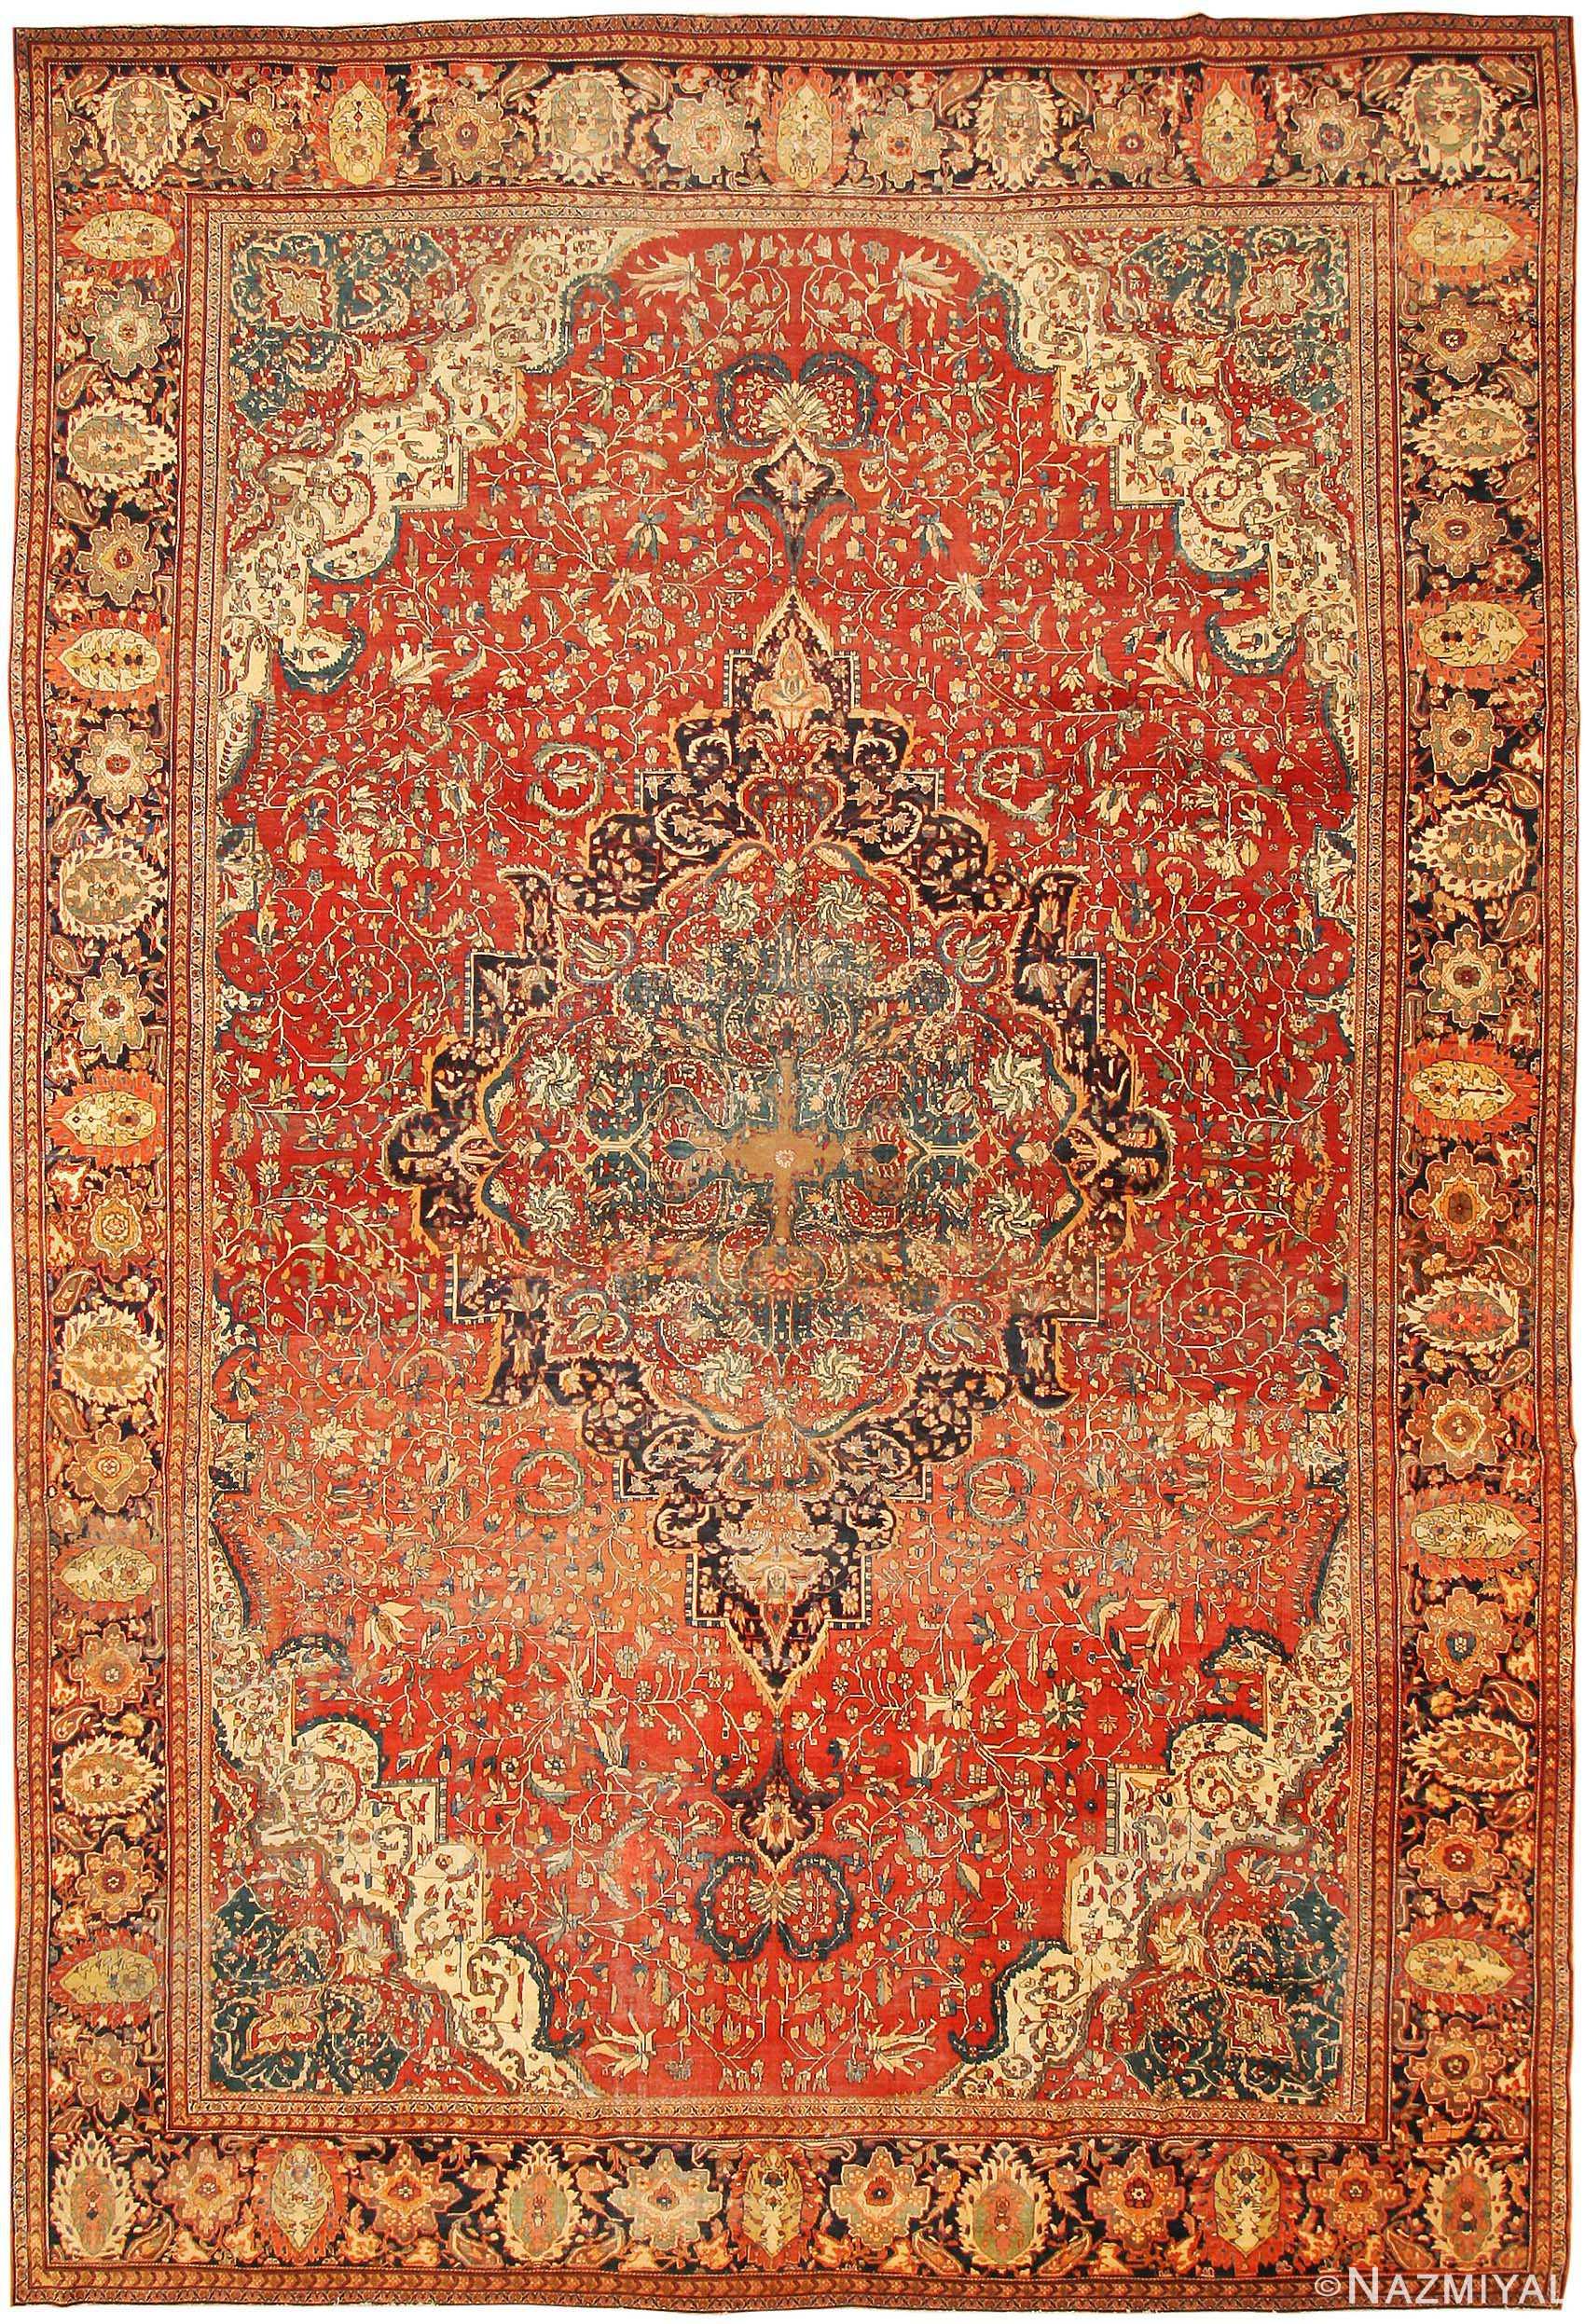 Persian rugs Purple Antique Sarouk Farahan Persian Rug 43328 Nazmiyal Antique Rugs Antique Sarouk Farahan Persian Rug 43328 Nazmiyal Collection